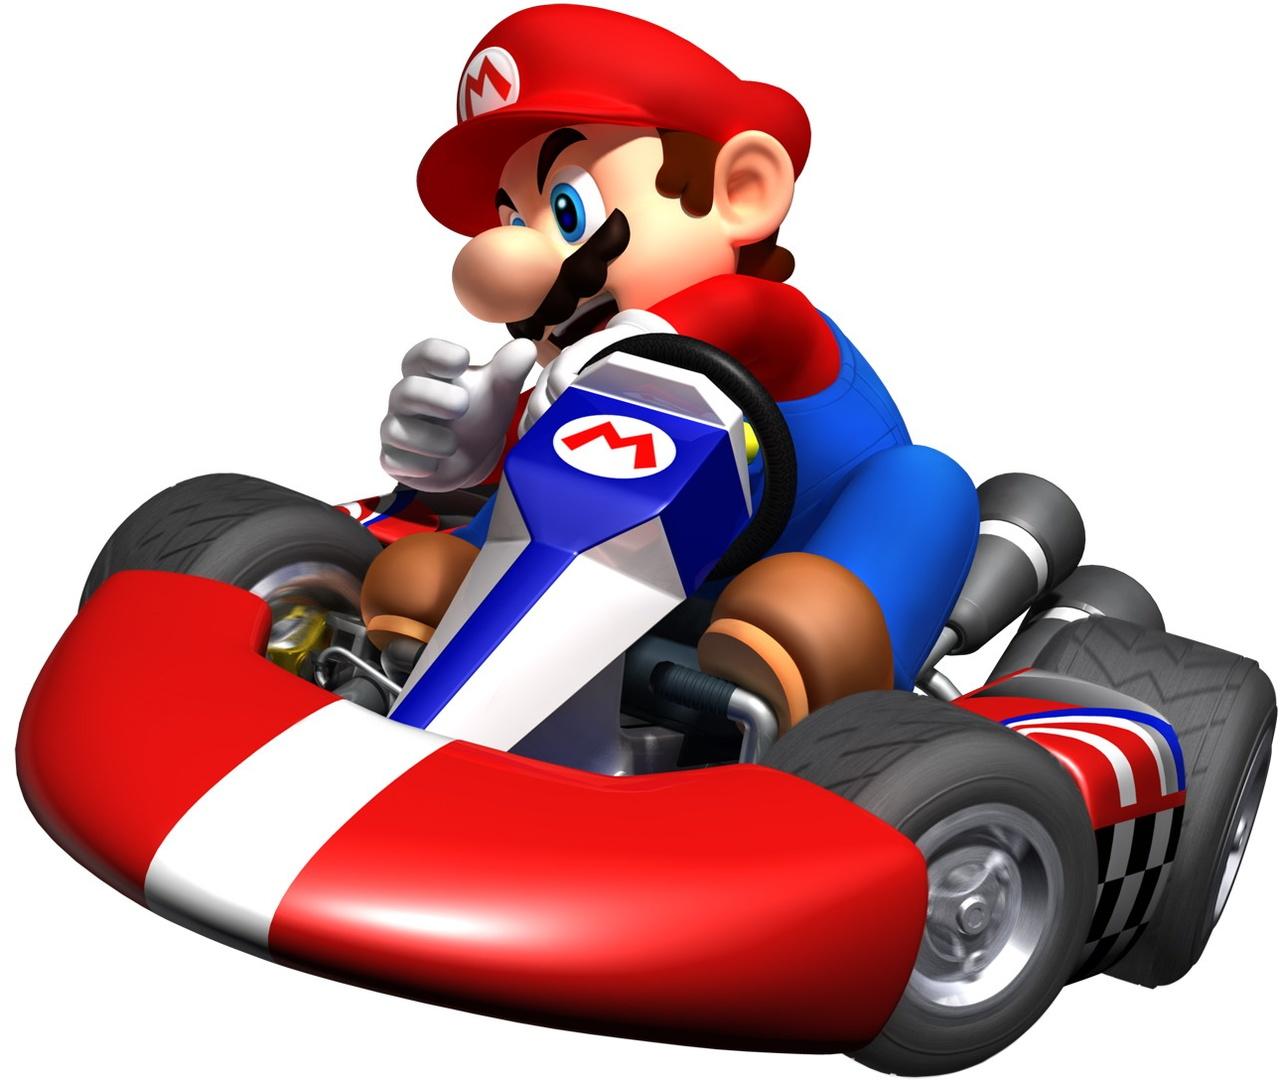 Mario Kart AI